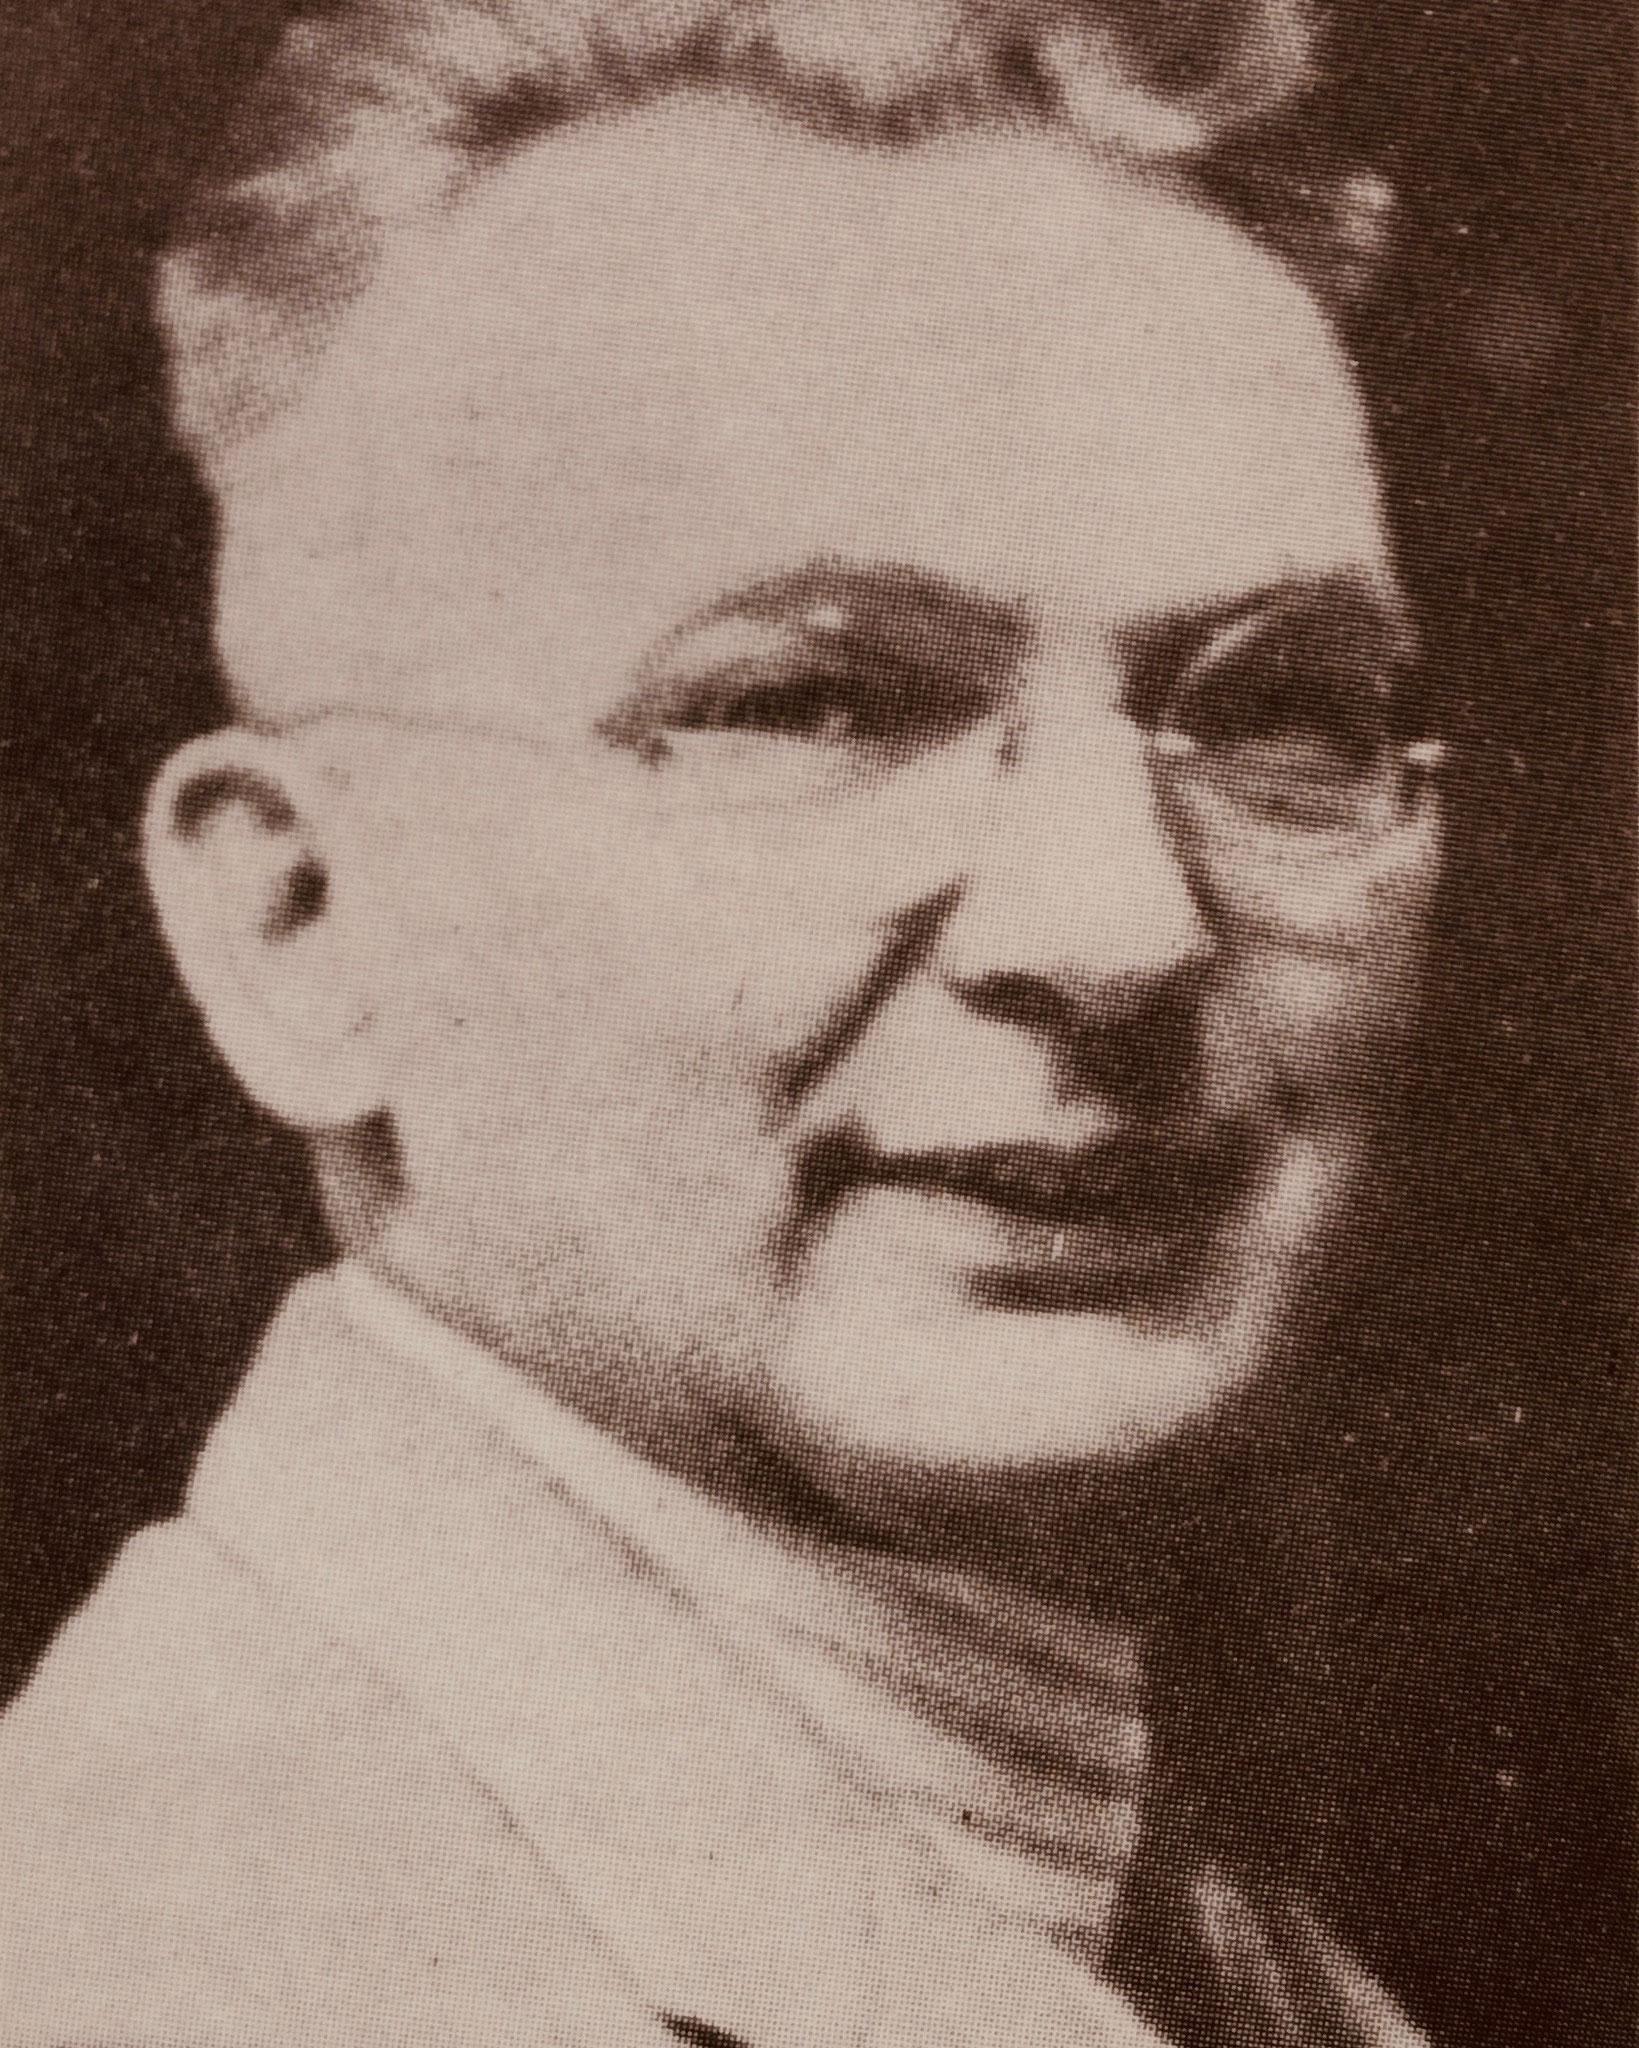 Gerhard Preitz